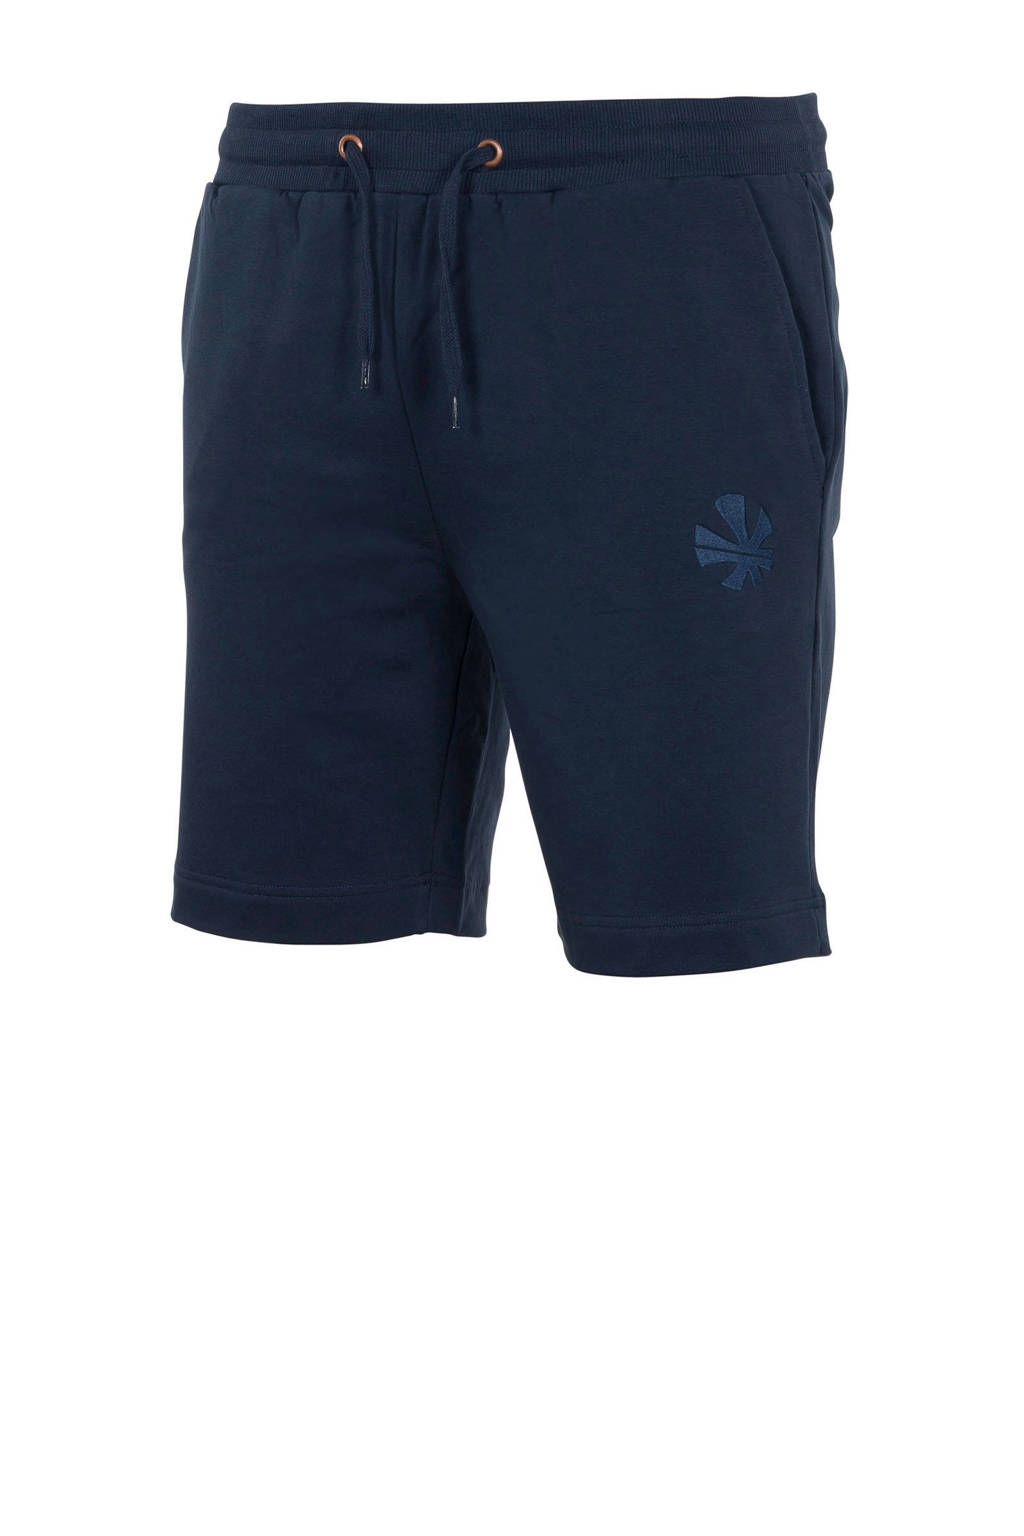 Reece Australia   sportshort donkerblauw, Donkerblauw